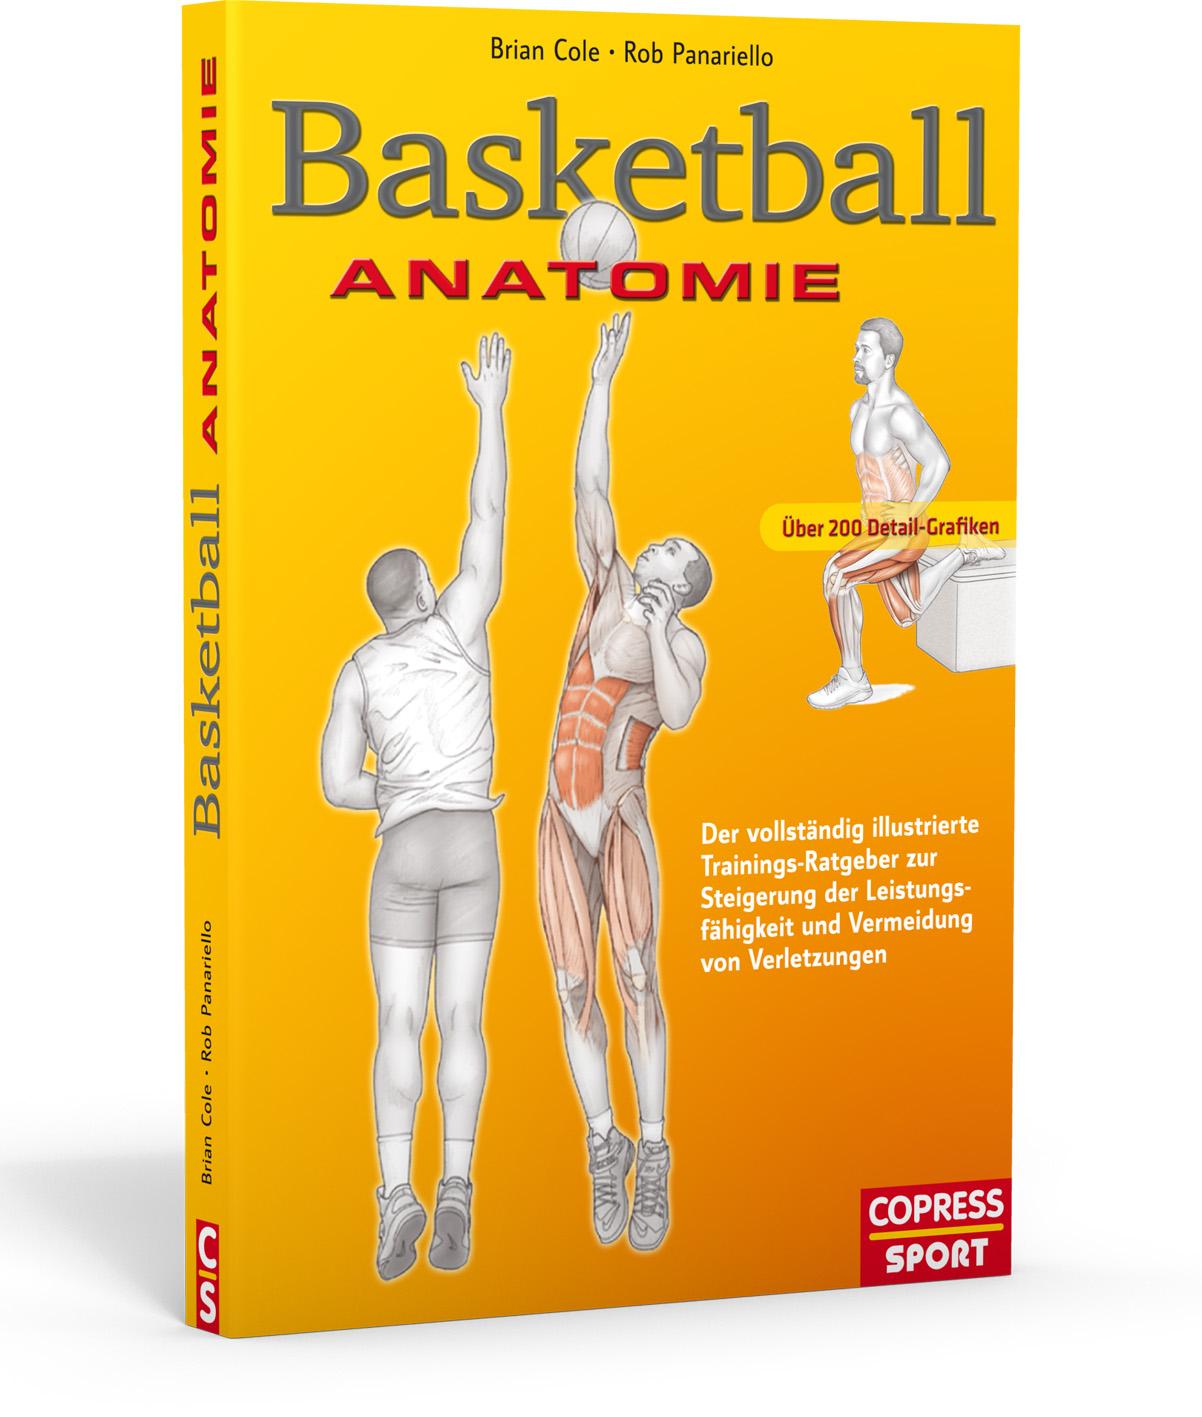 Basketball-Anatomie-Brian-Cole